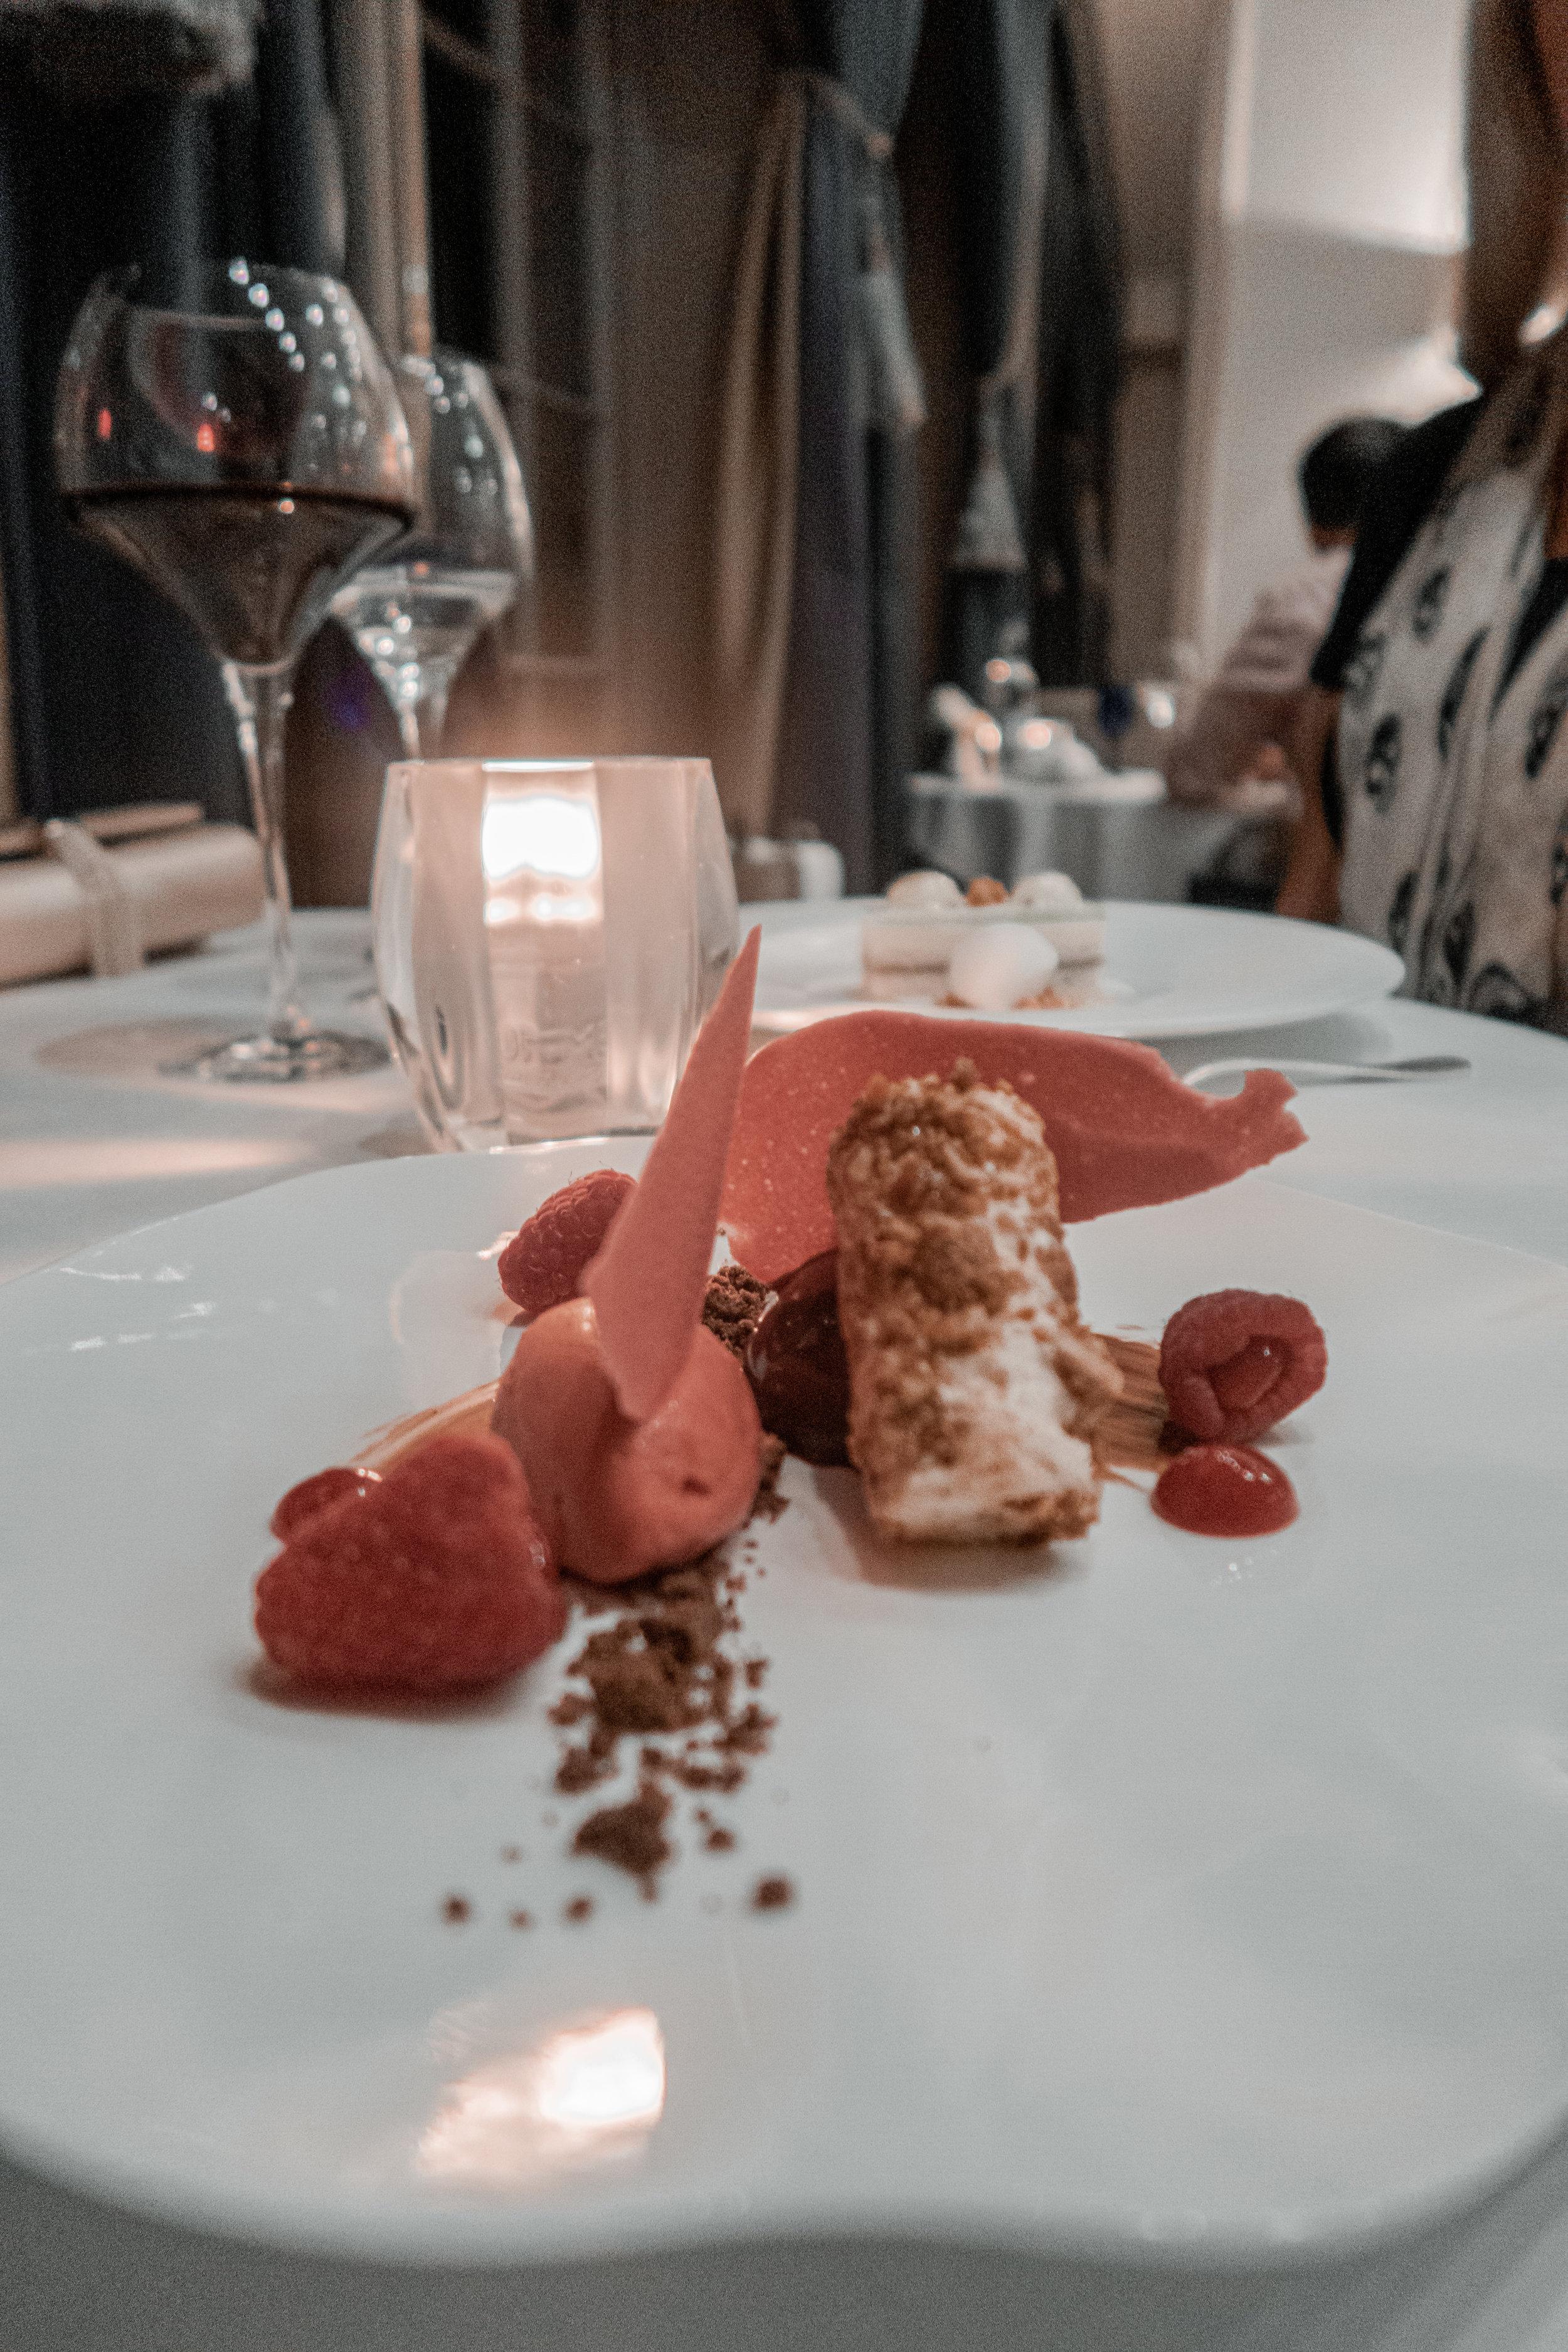 peanut parfait royal crescent hotel bath nicole fiona serrao lets eat with nicole